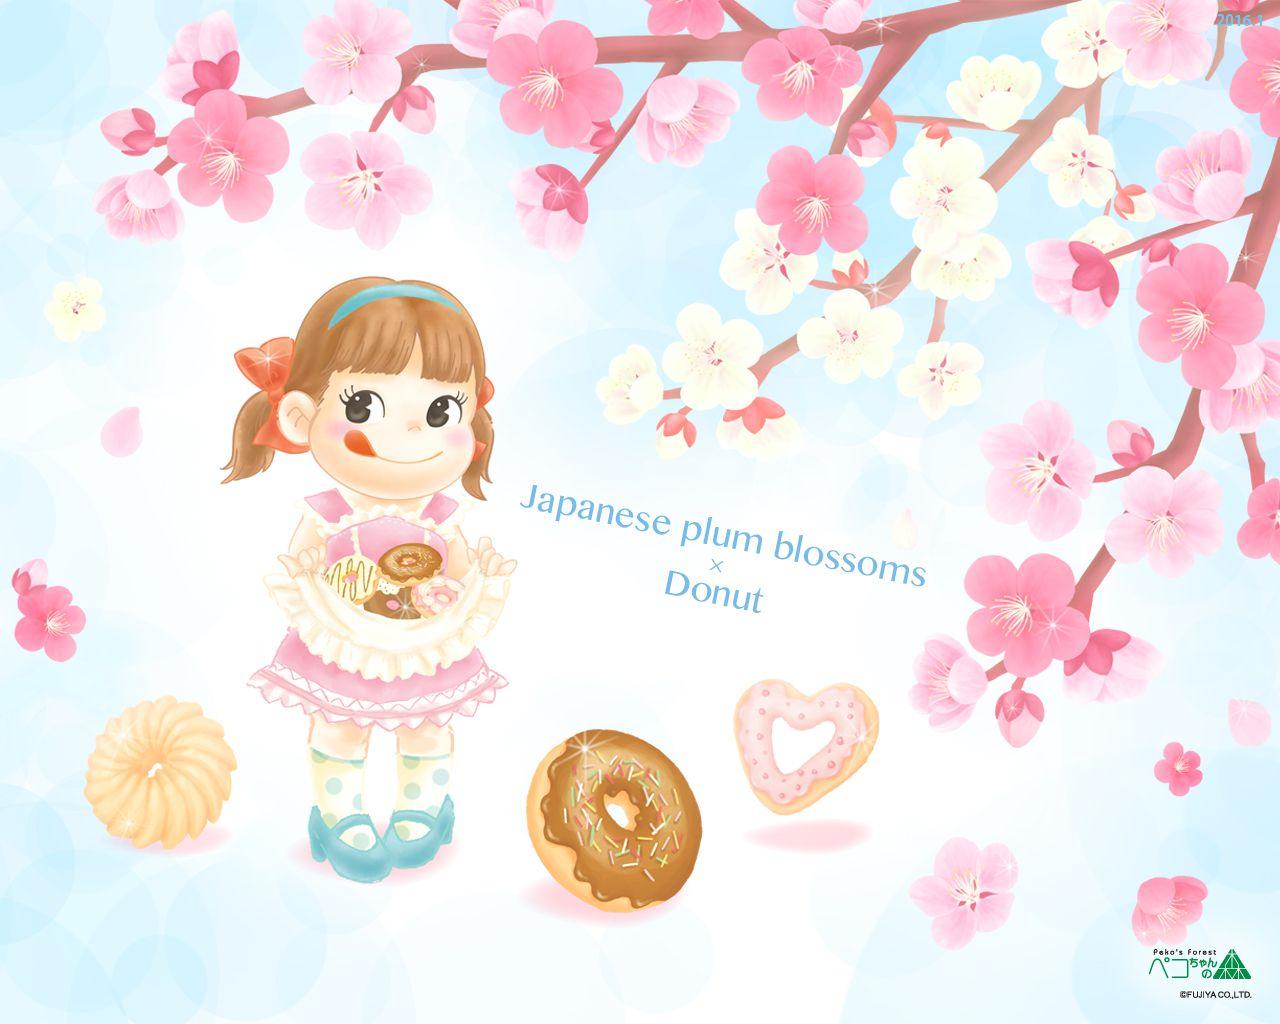 peko chan japanese candy kawaii イラスト 可愛い キャラクター 壁紙